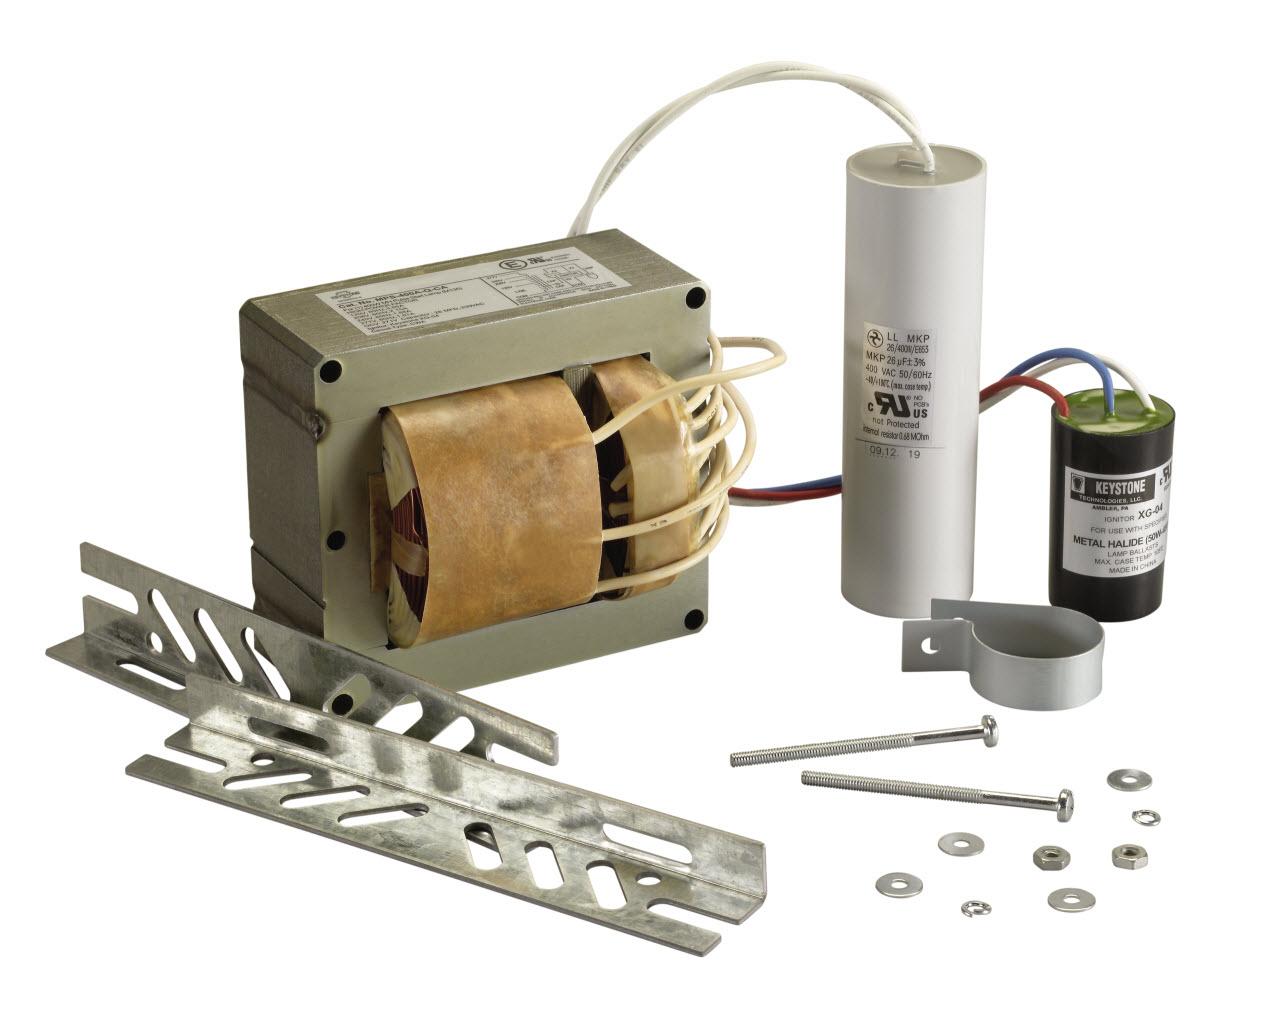 100w Hps Ballast Kit Wiring Diagram Metal Halide Ballast Kit 866 637 1530